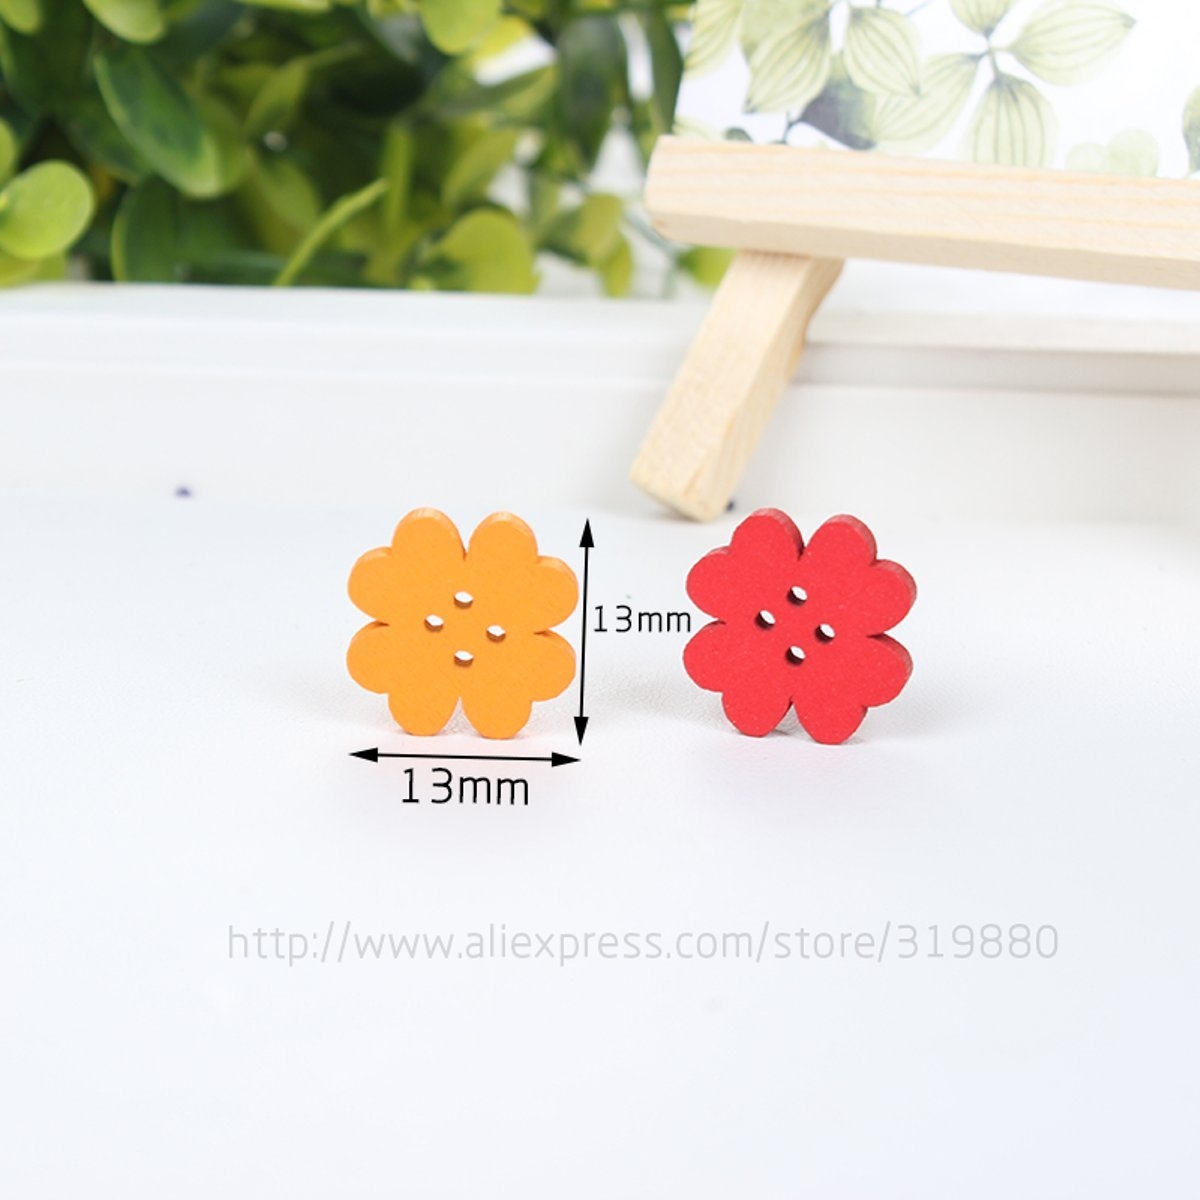 HDTTCX - Botones de madera para manualidades - Botones de madera para coser - 50 piezas de 13 mm 2 agujeros trébol de cuatro hojas botón DIY circular ...